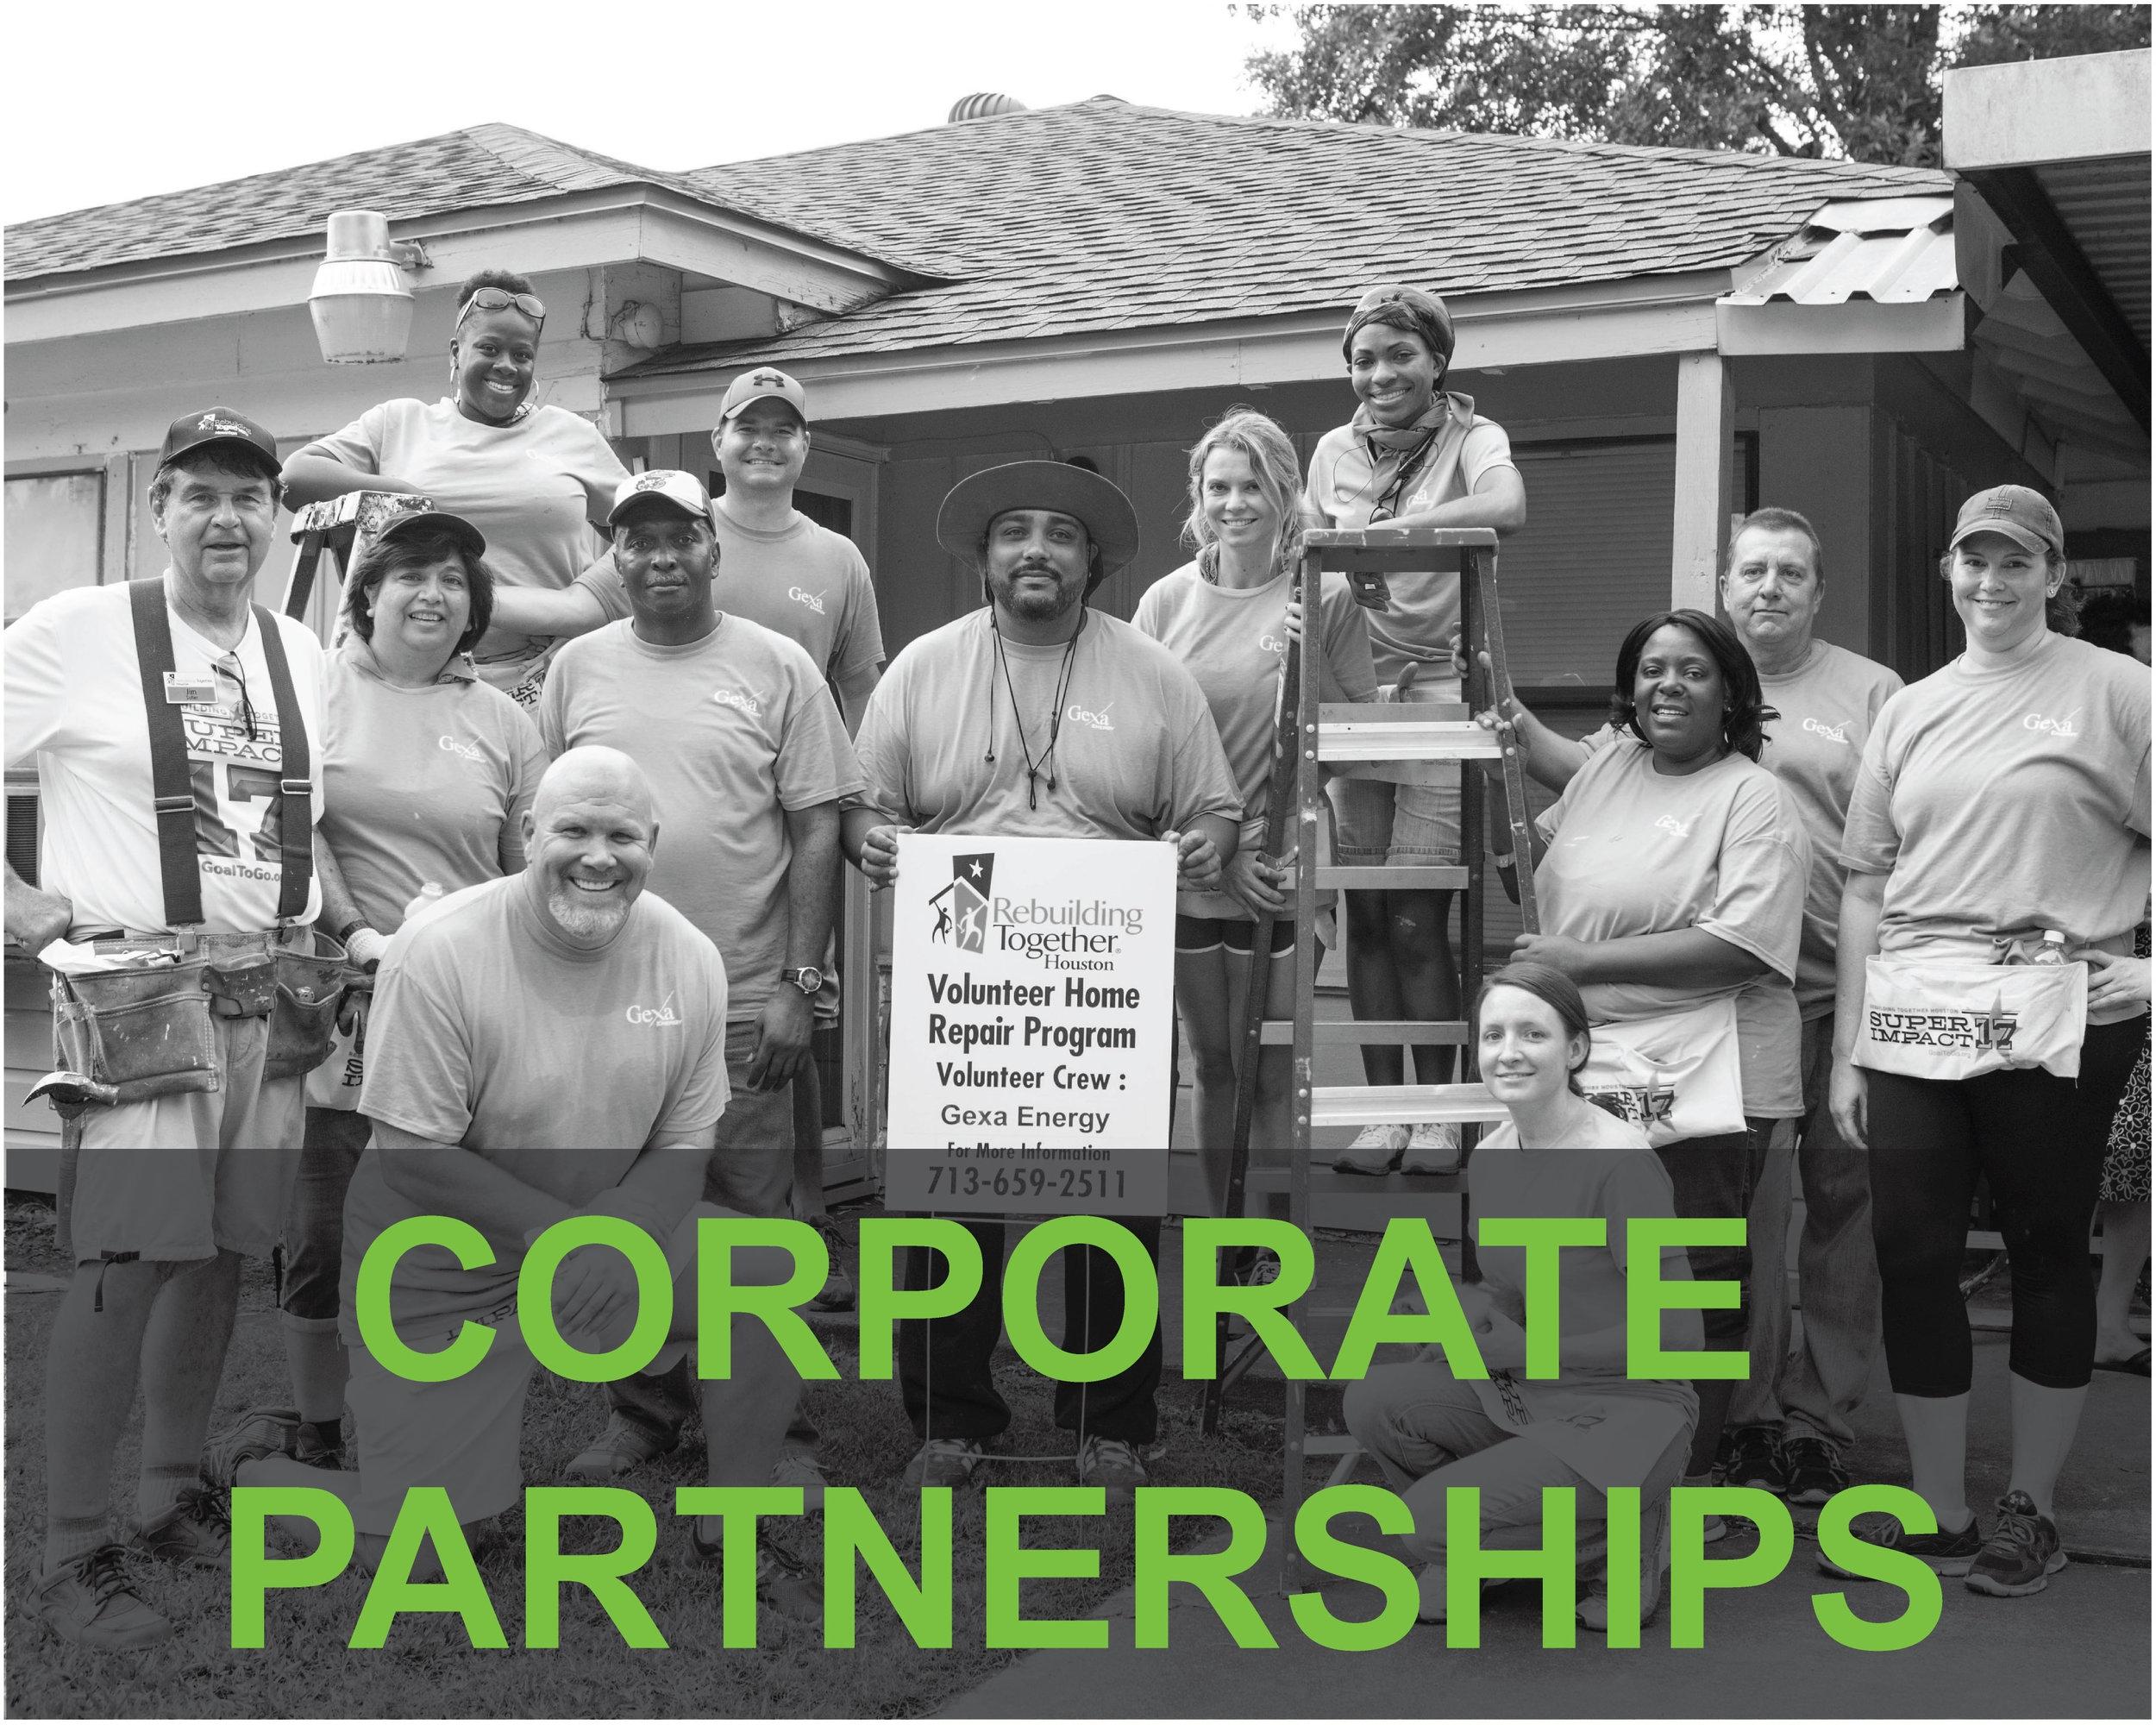 CorporatePartnerships.jpg